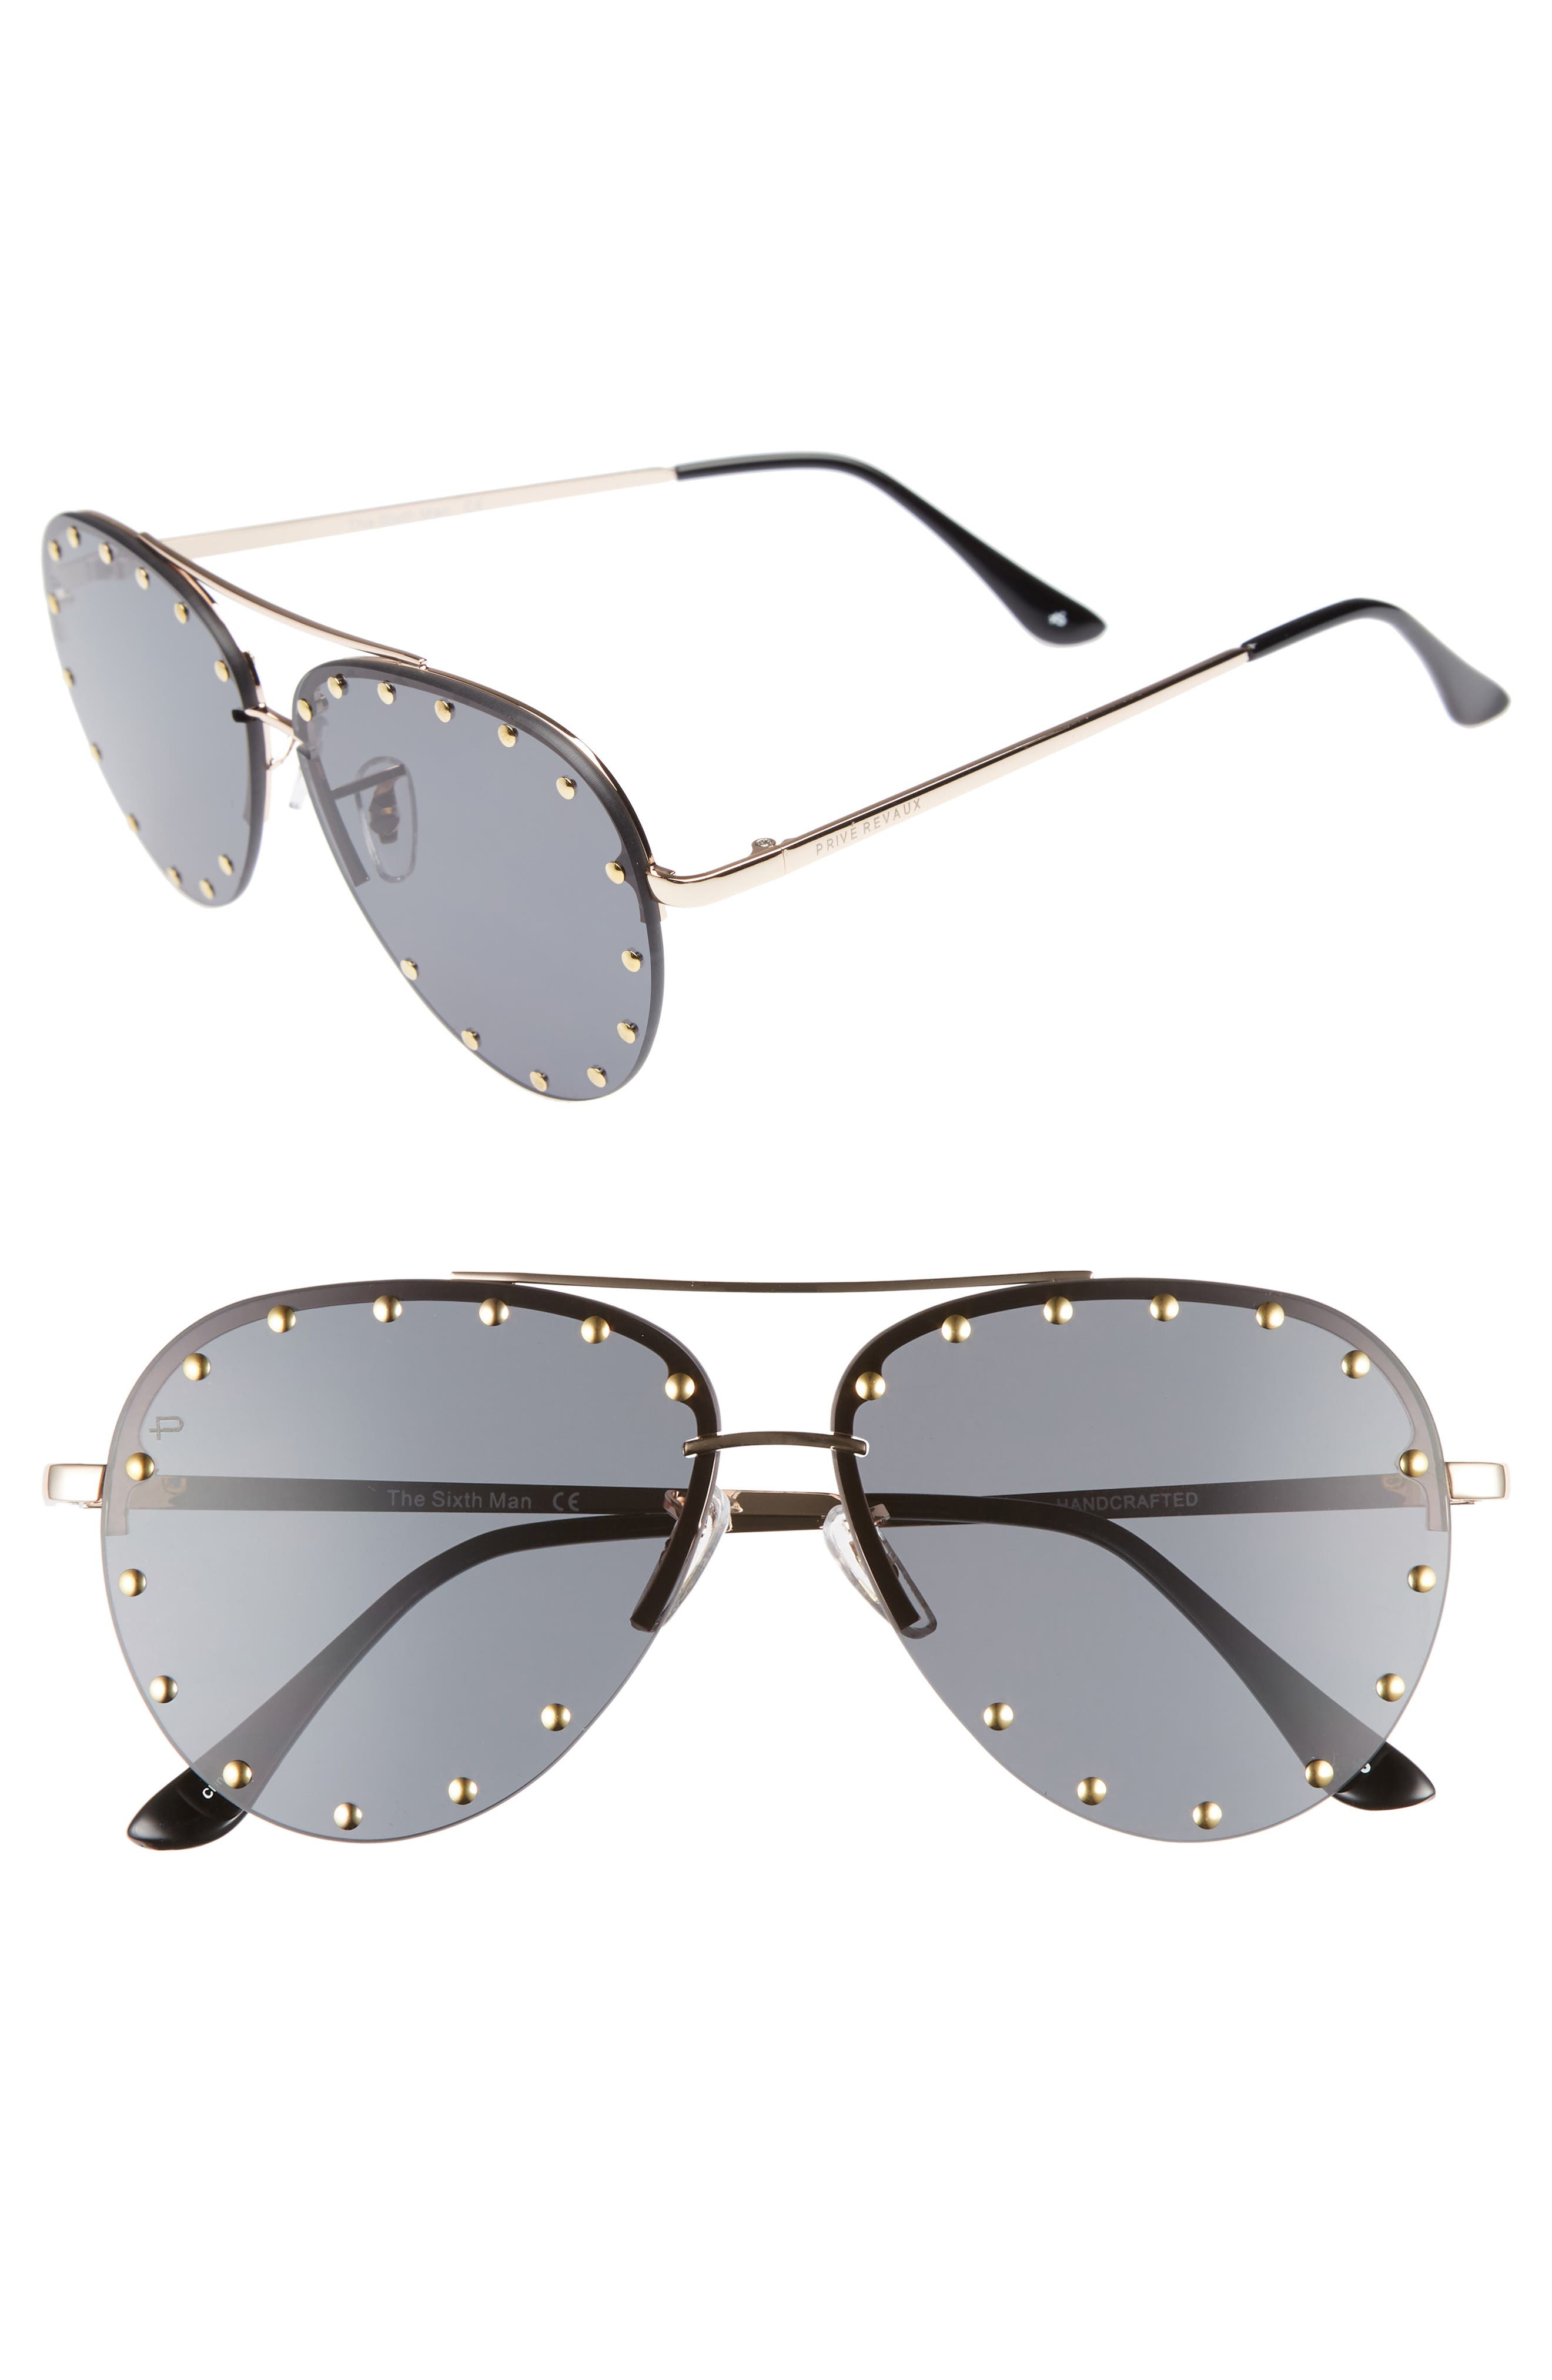 Privé Revaux The Sixth Man 60mm Studded Aviator Sunglasses,                             Main thumbnail 1, color,                             001